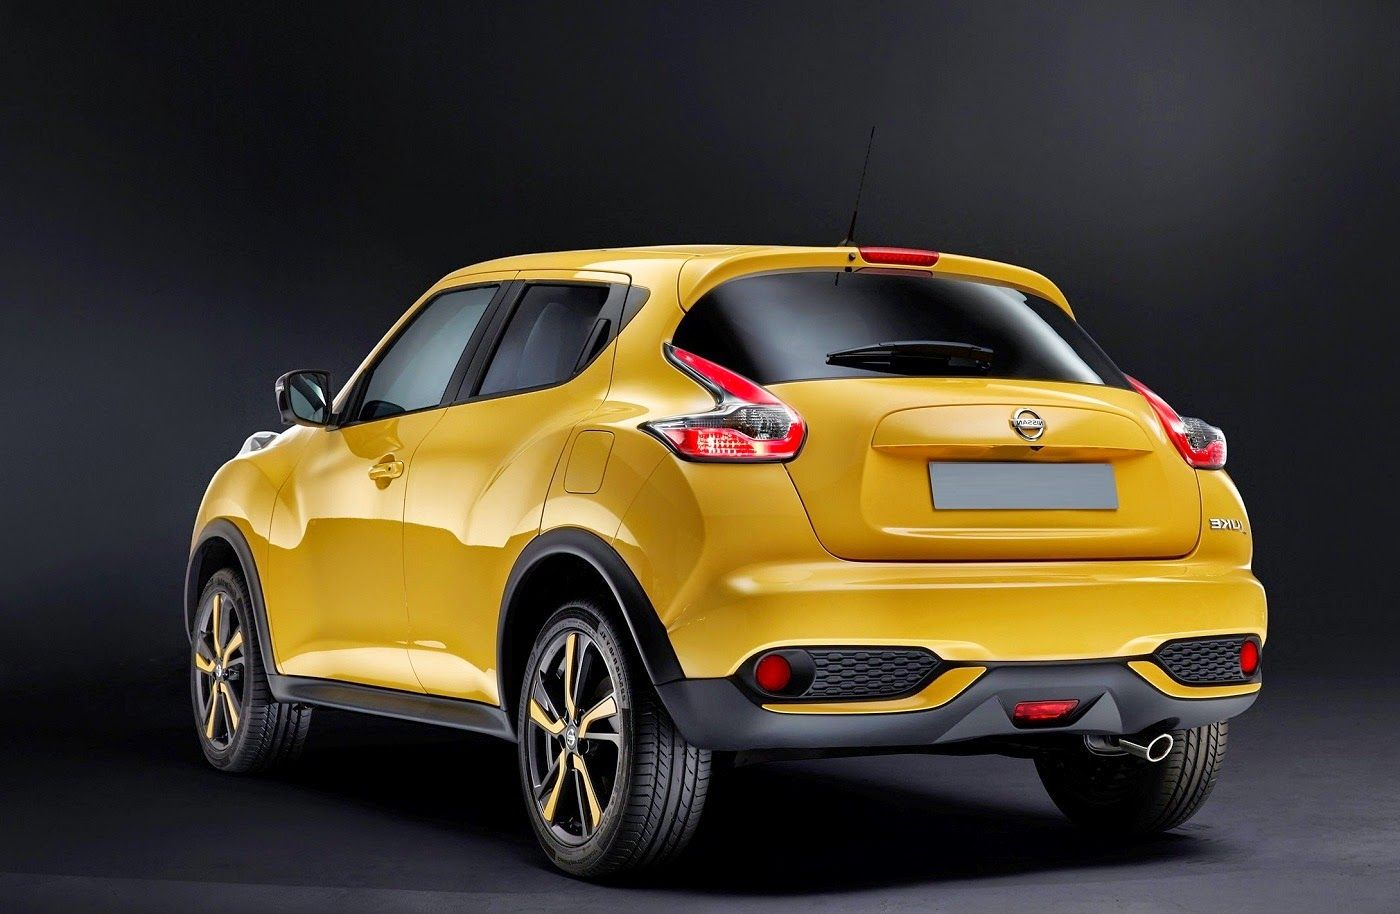 Car reviews new cars 2014 and 2015 model year 2015 nissan juke 1 2 dig